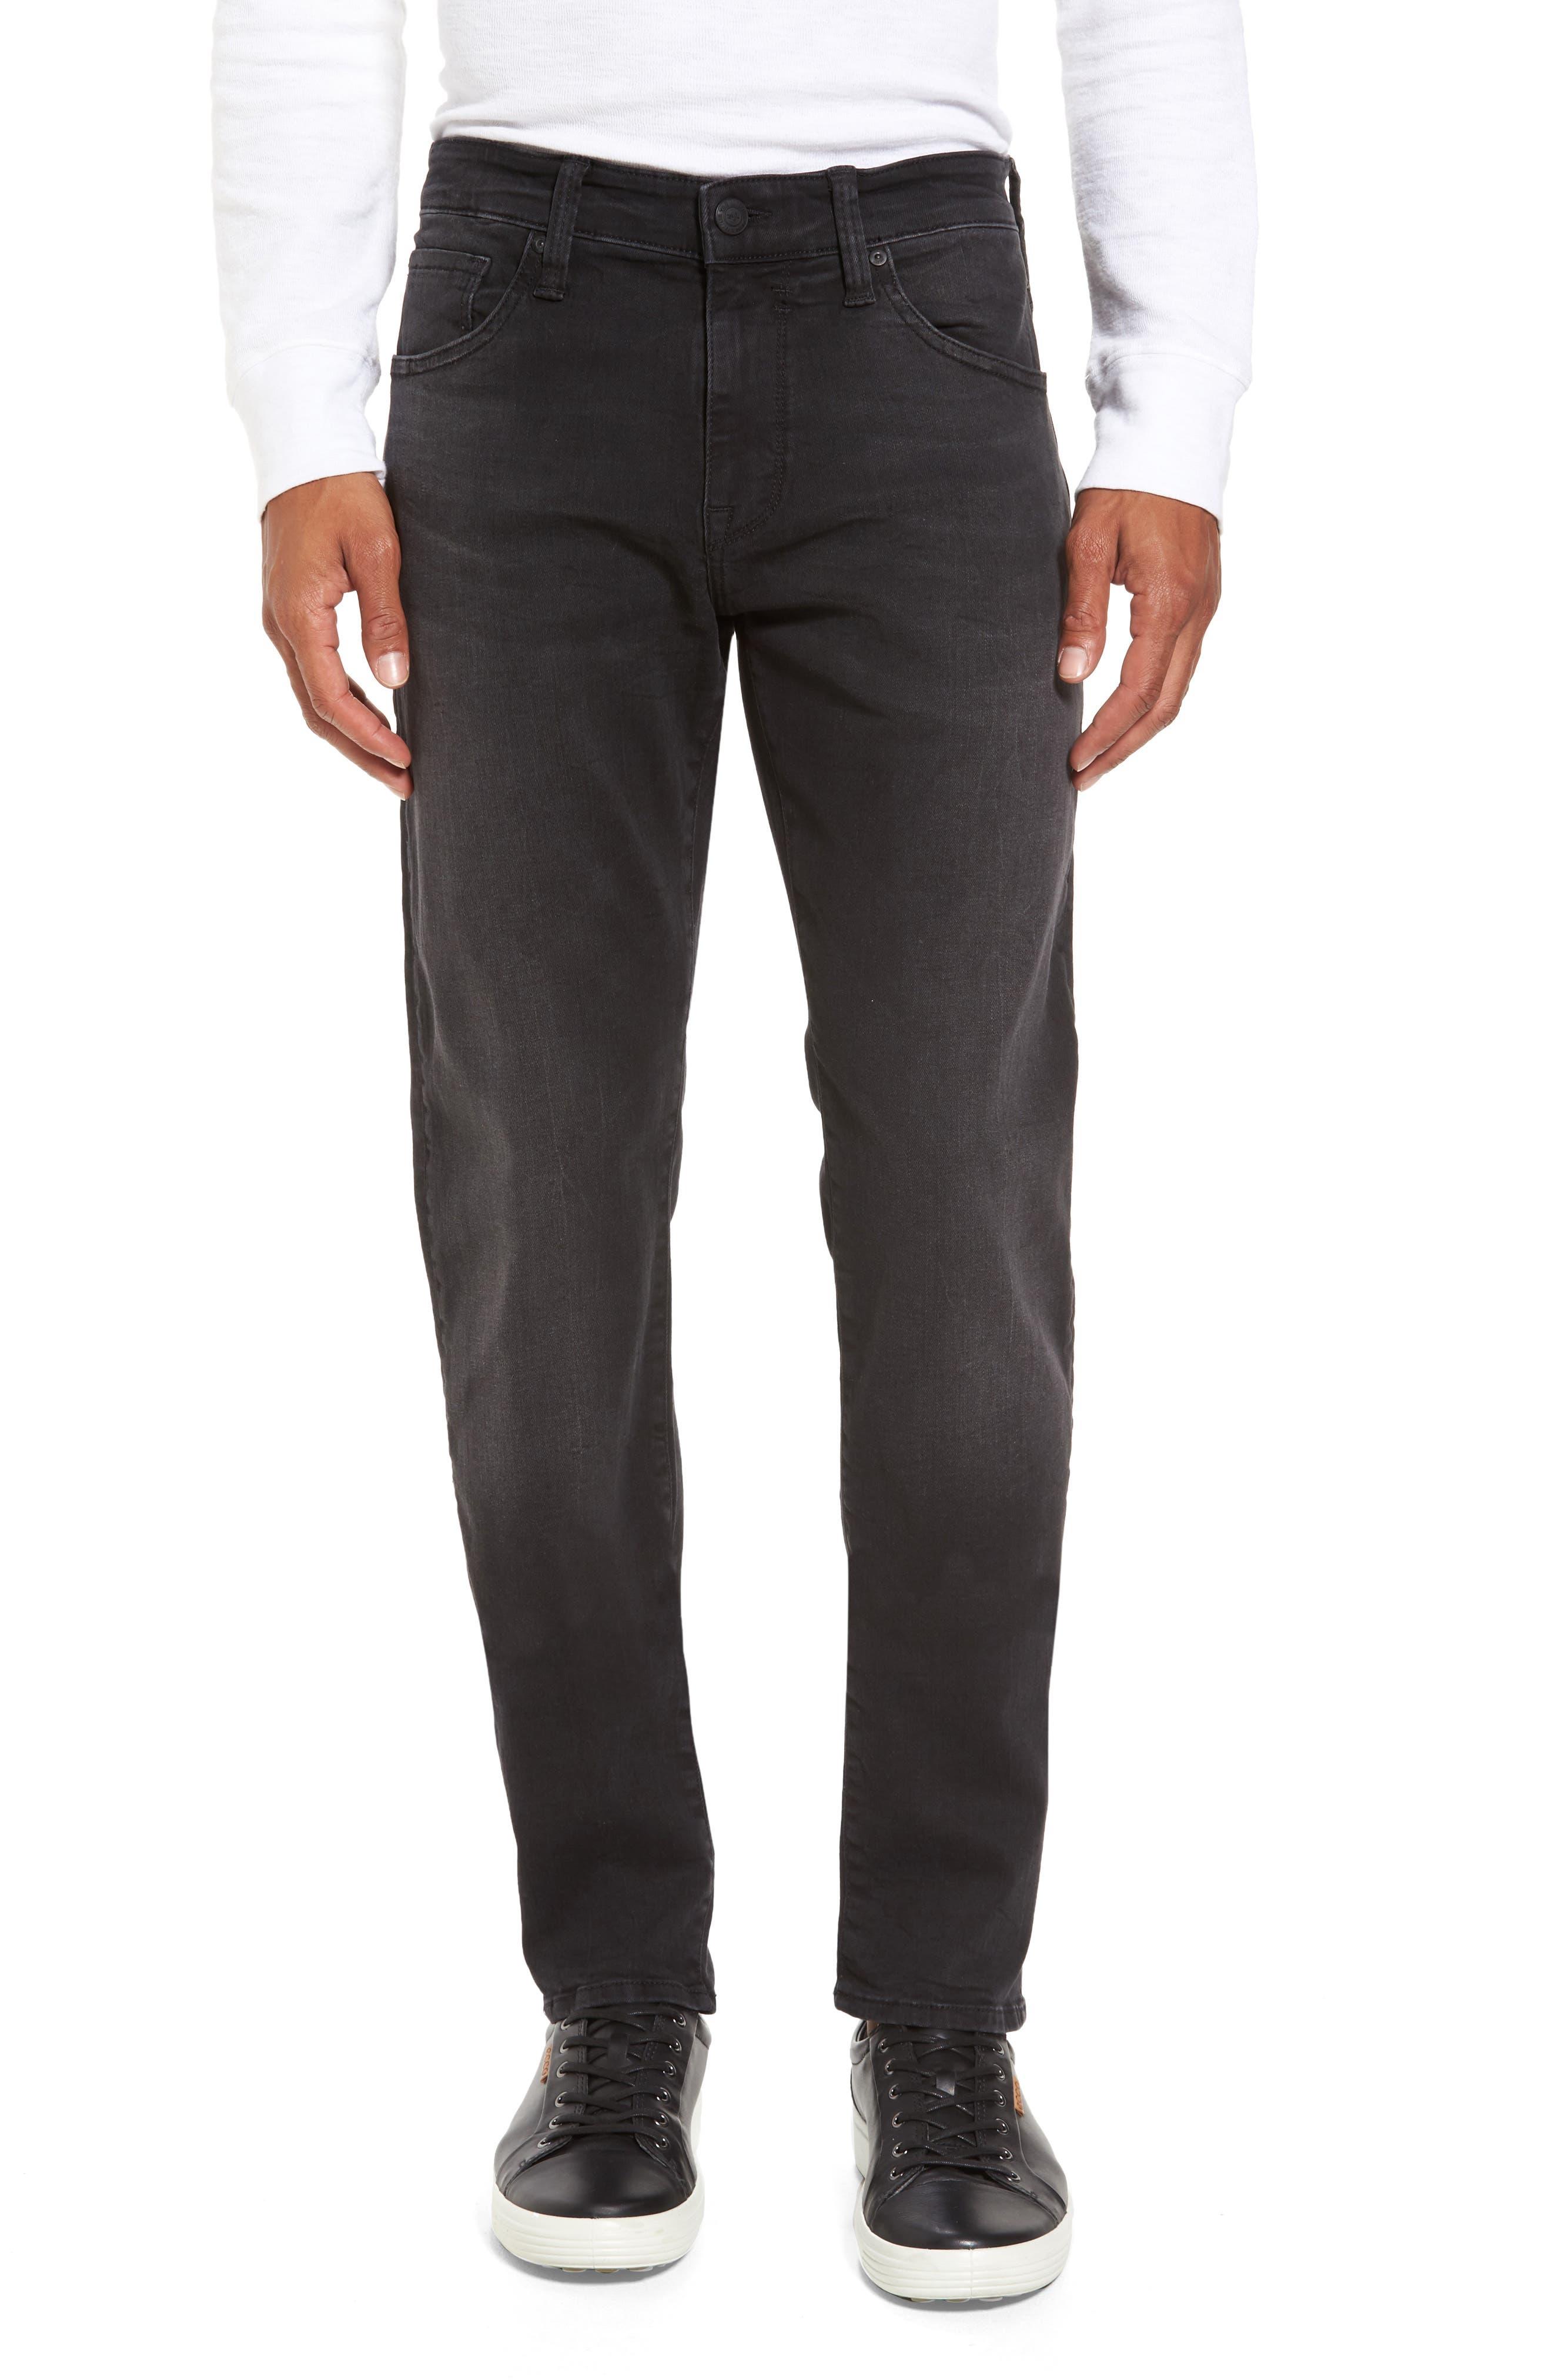 Jake Slim Fit Jeans,                             Main thumbnail 1, color,                             020